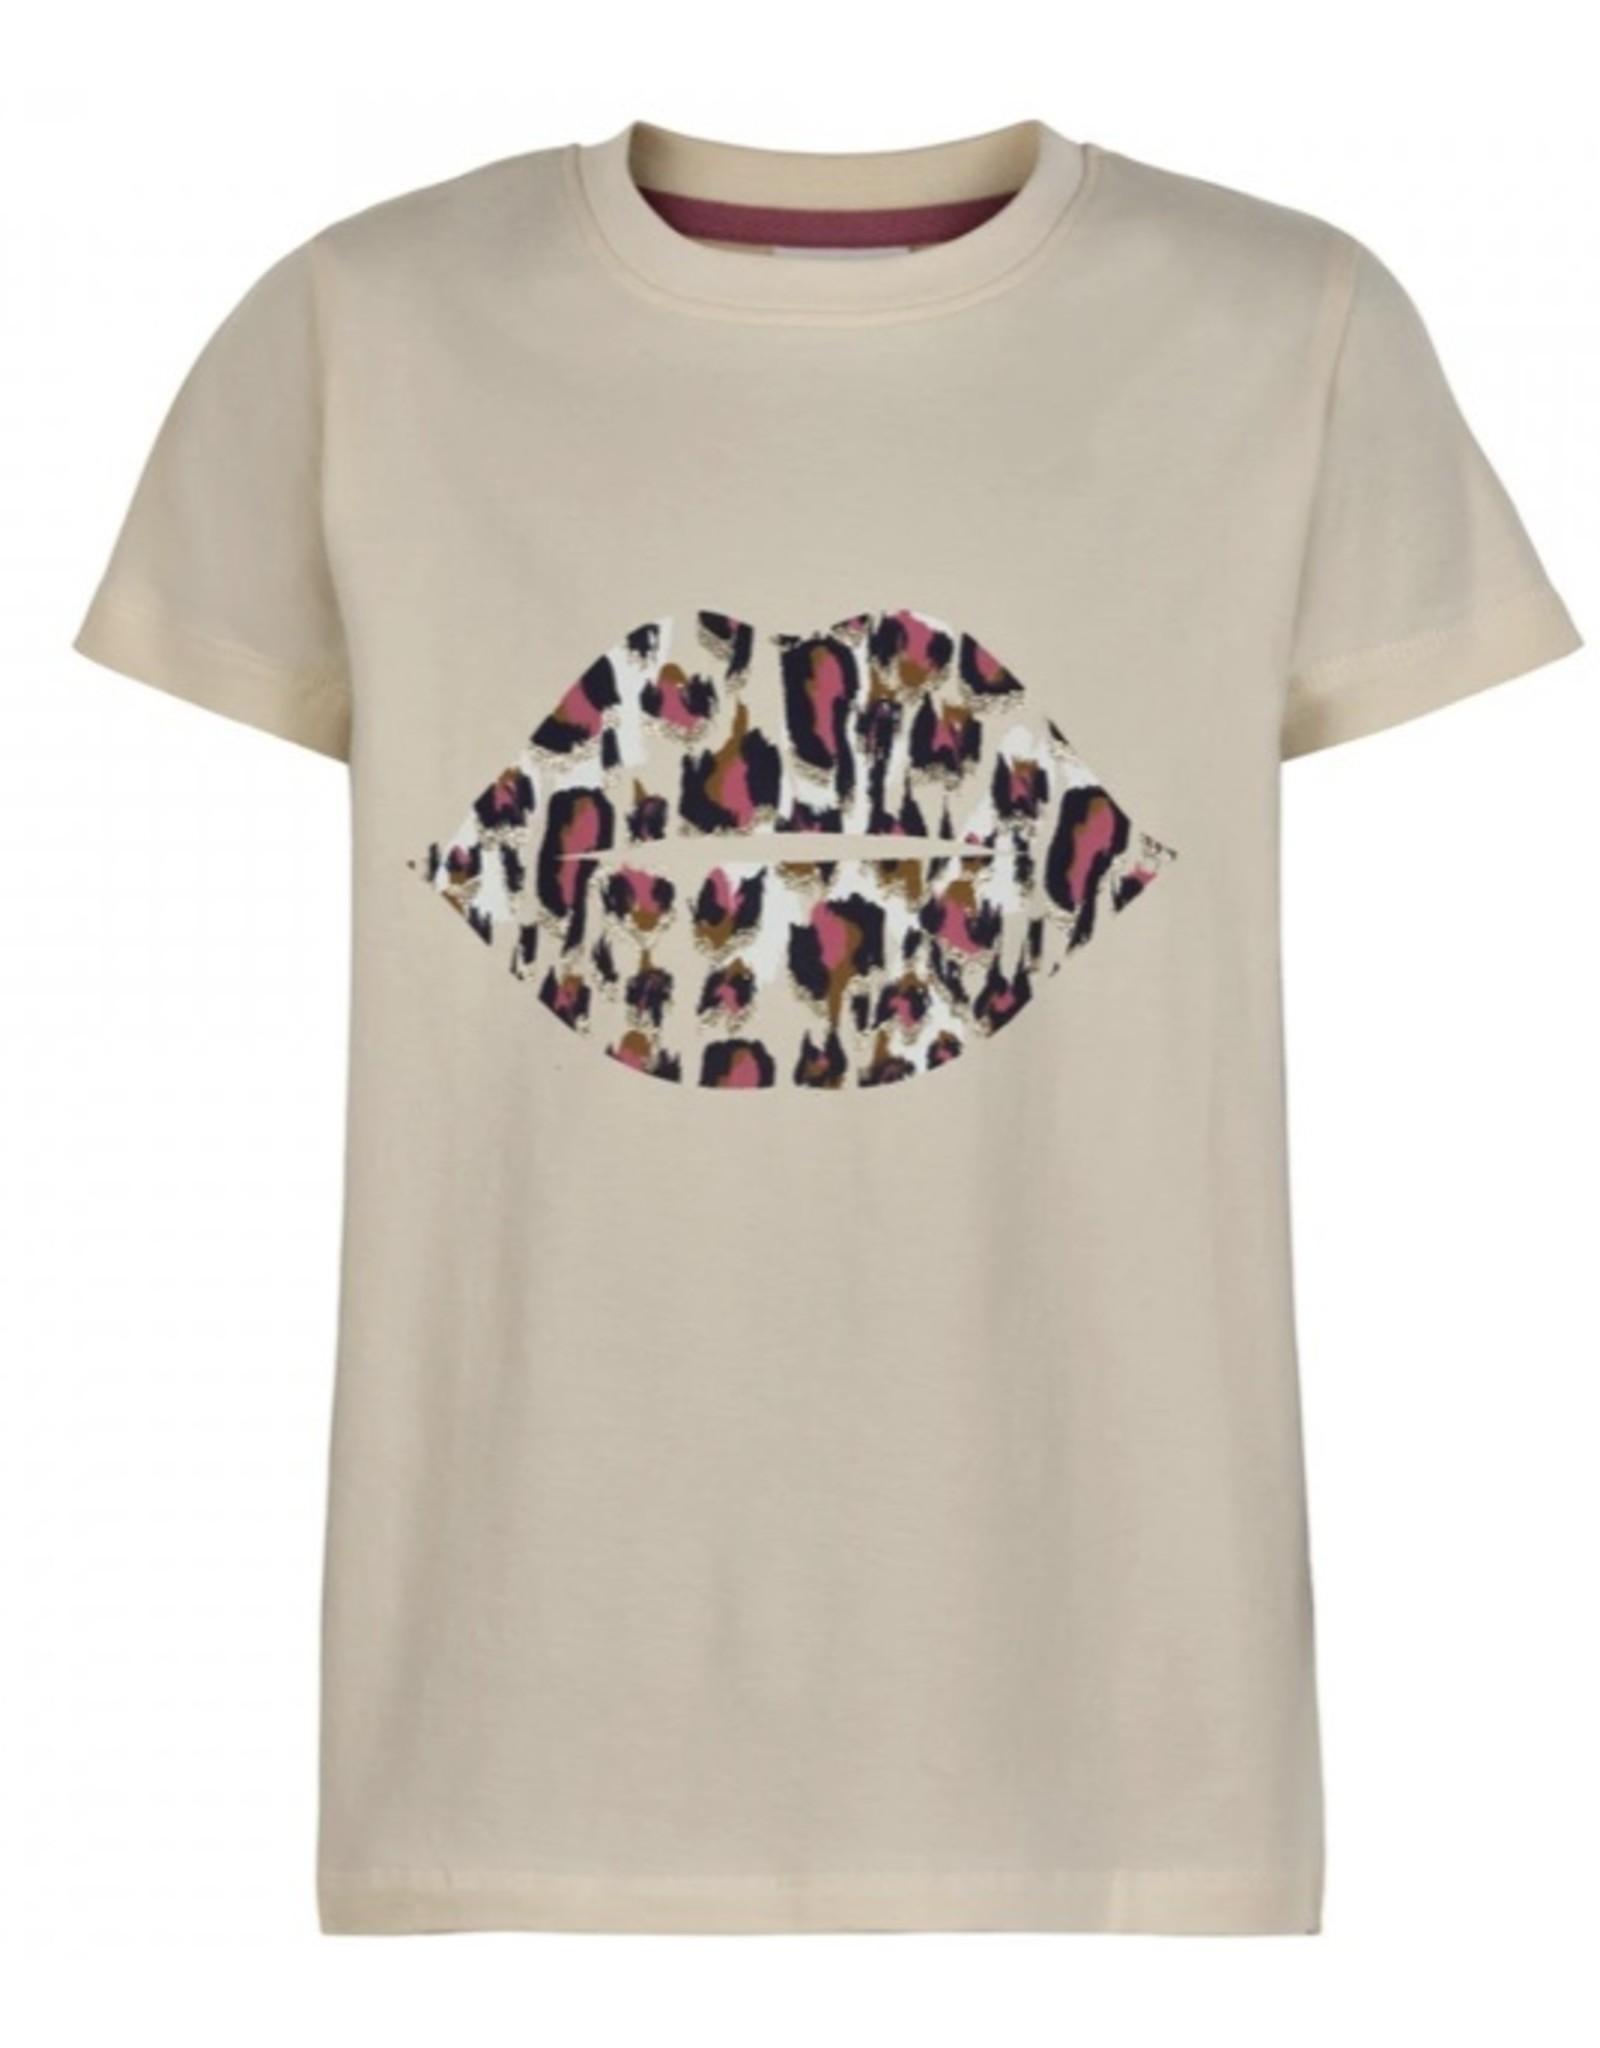 The New Tyra T-Shirt